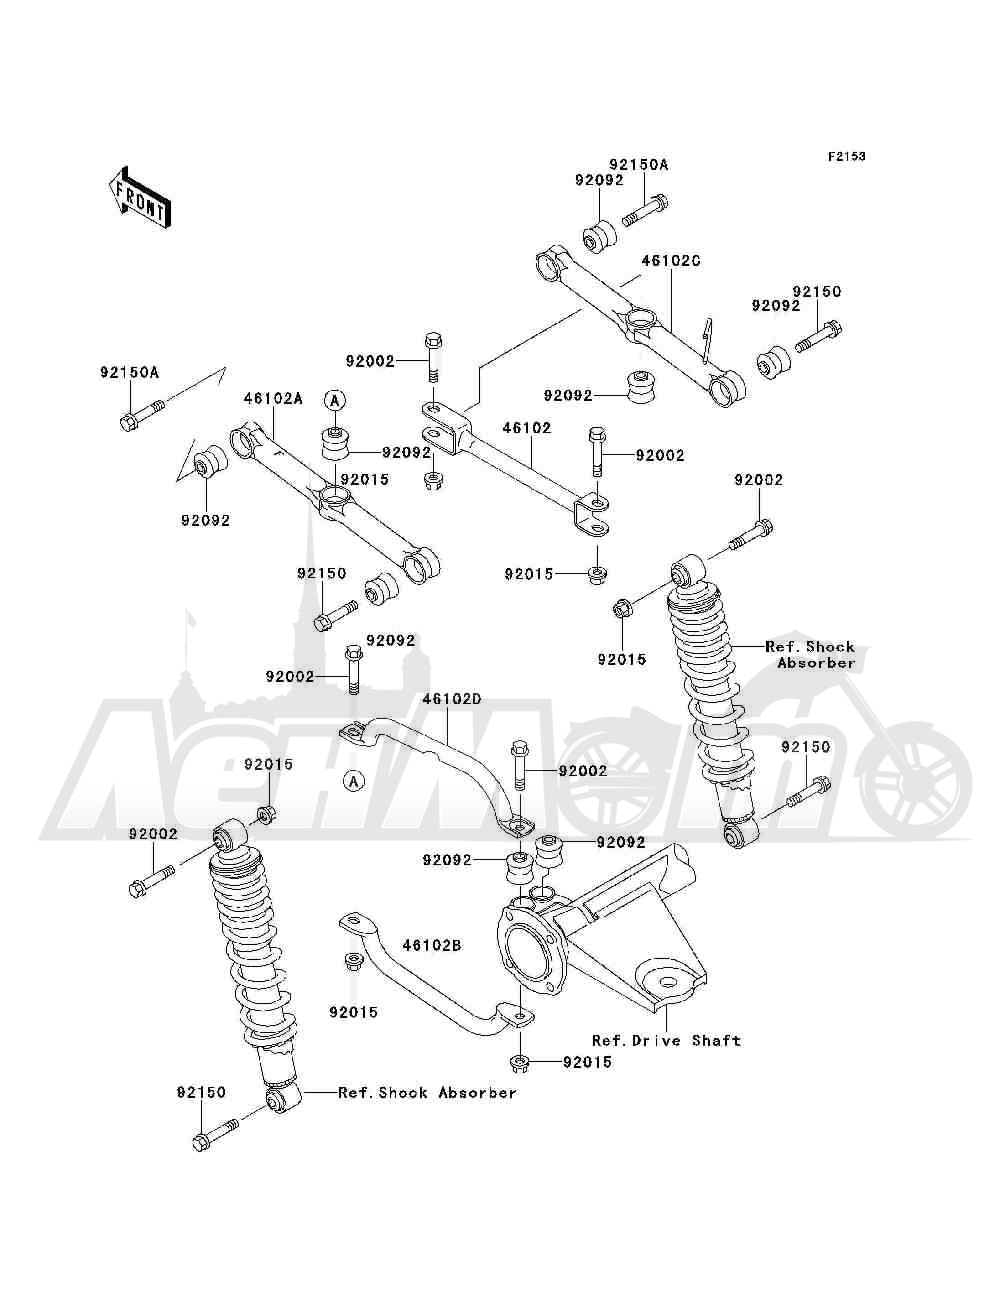 Запчасти для Квадроцикла Kawasaki 1994 BAYOU 300 4X4 (KLF300-C6) Раздел: REAR SUSPENSION | задняя подвеска